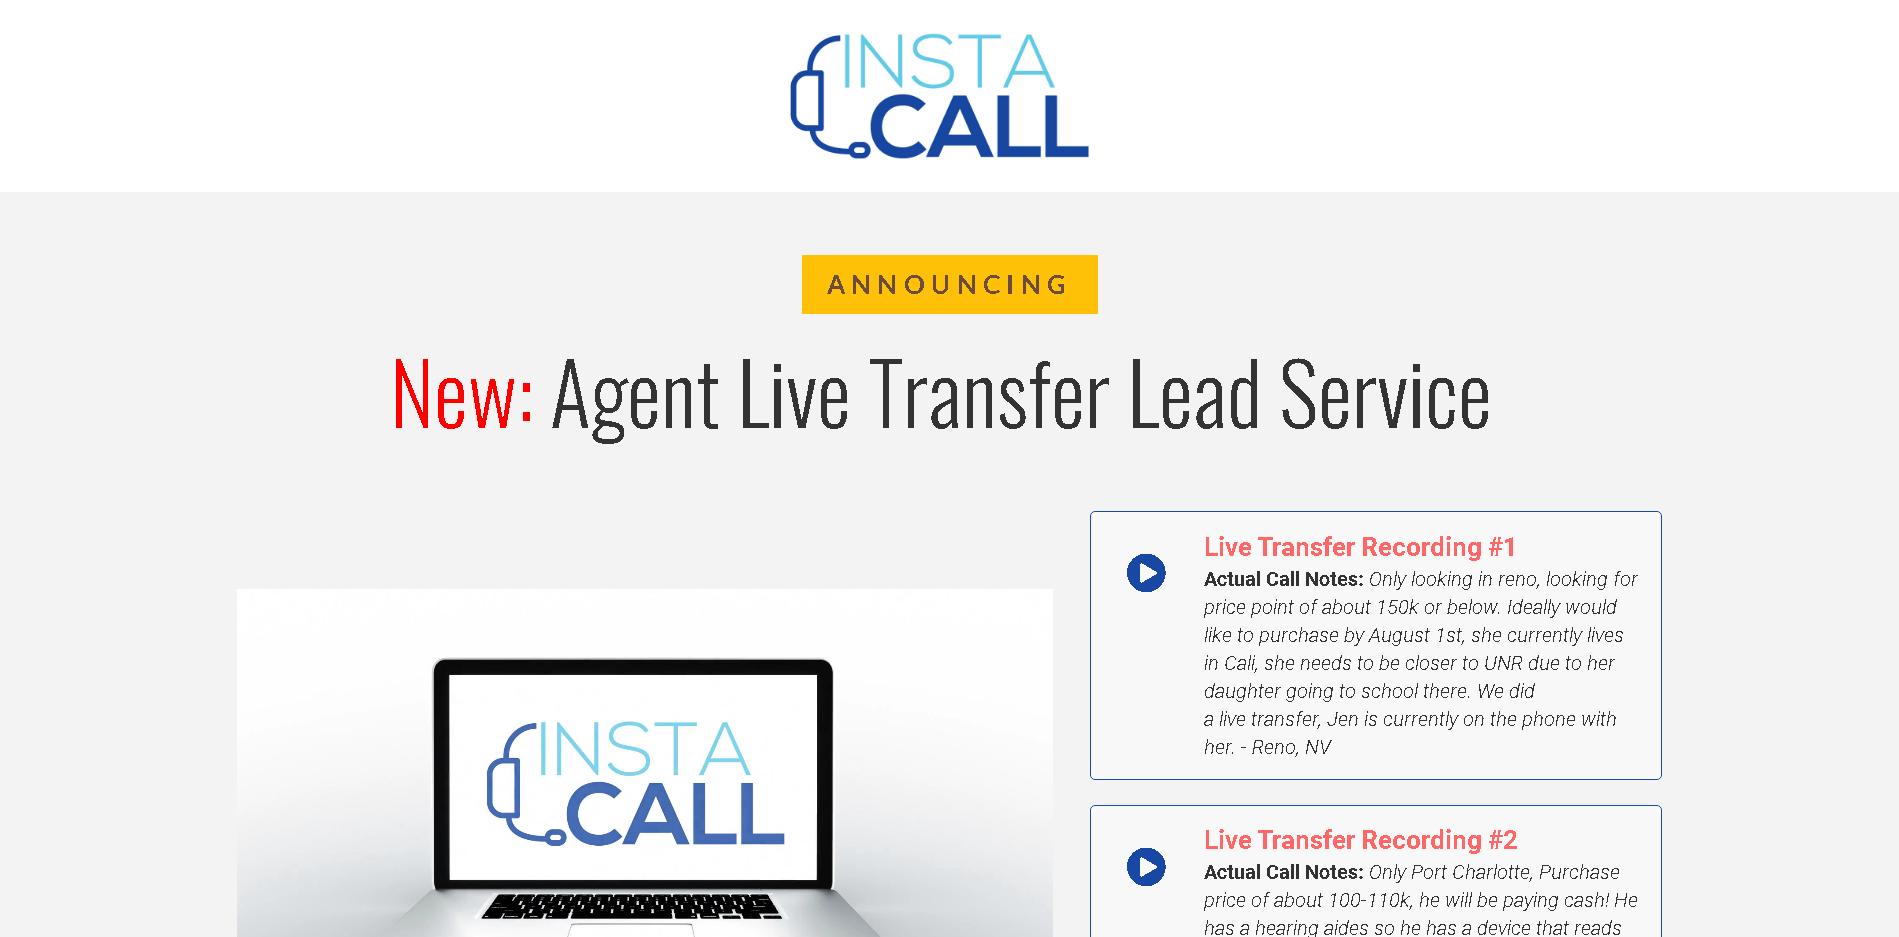 Live Transfer Leads (1)